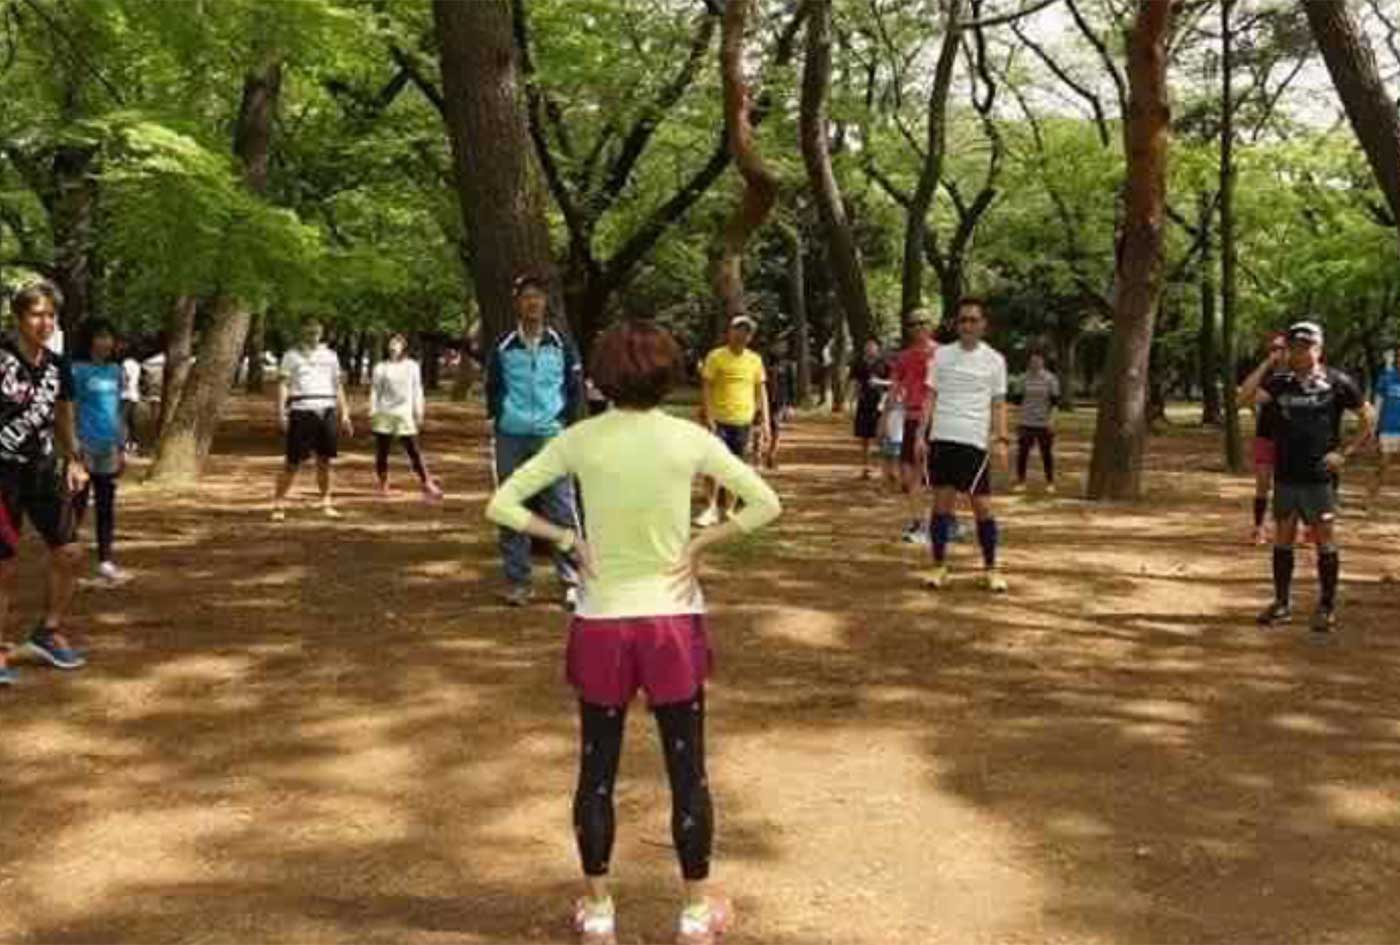 青梅マラソン試走会&新年会   東京(青梅市総合体育館)